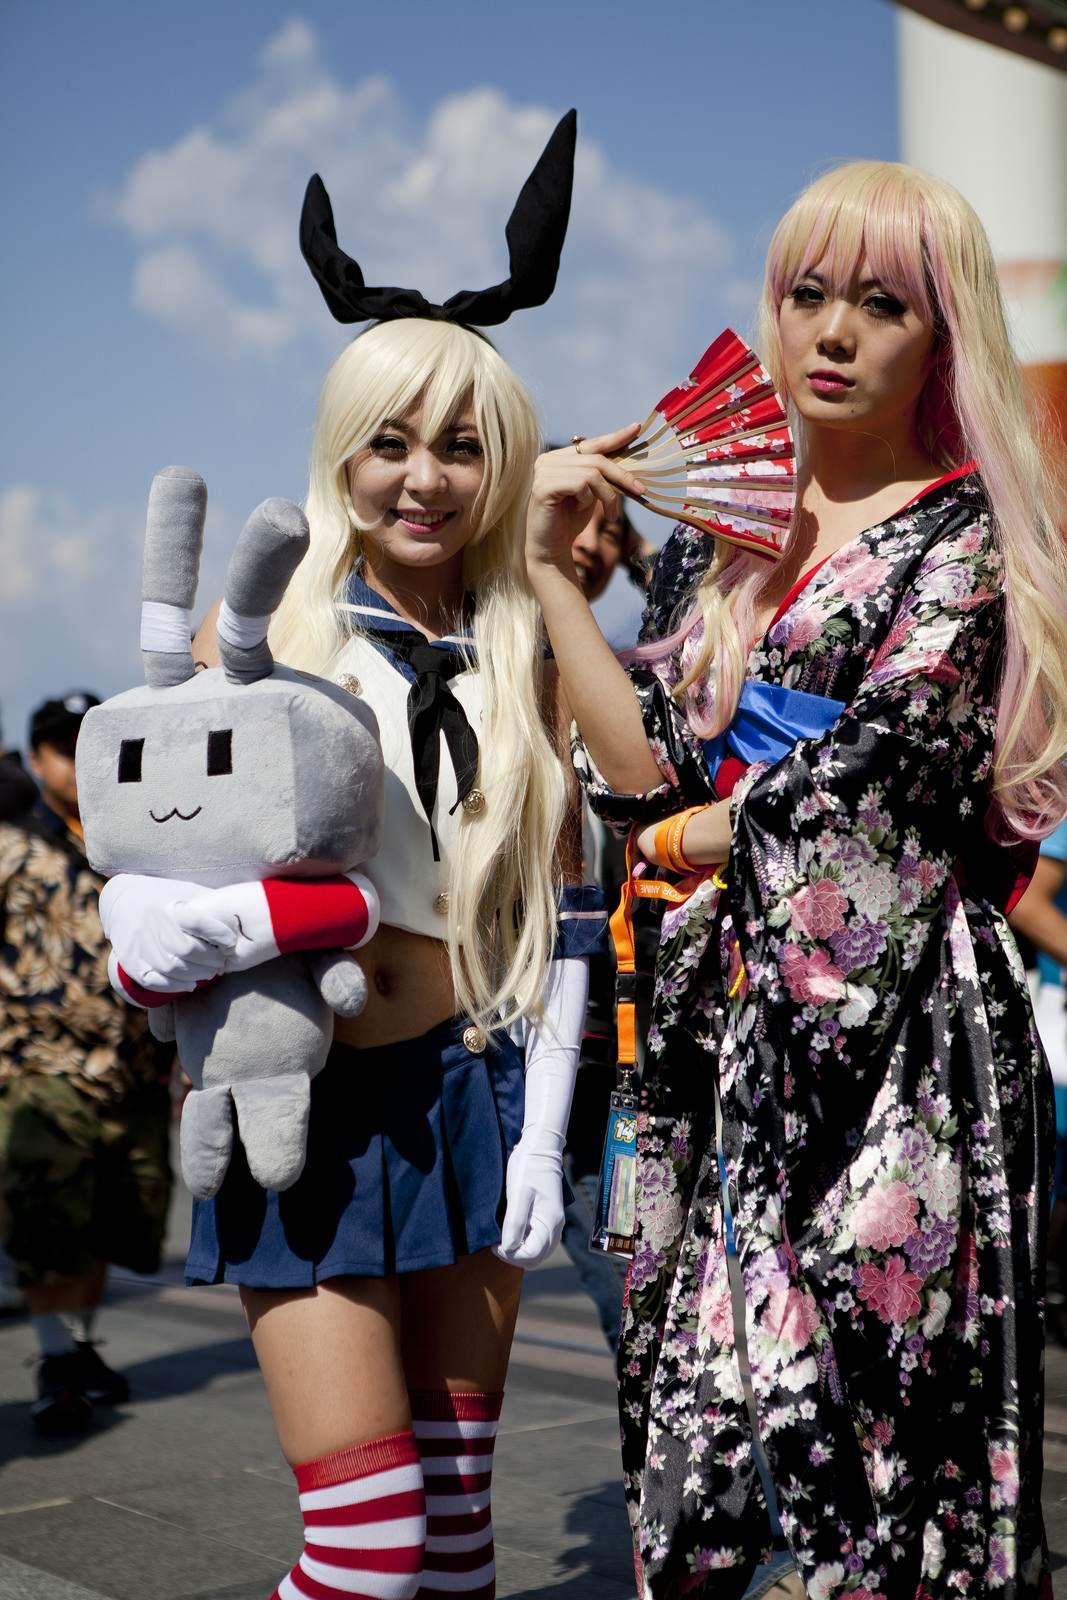 anime10 Anime Revolution 2014, Canada